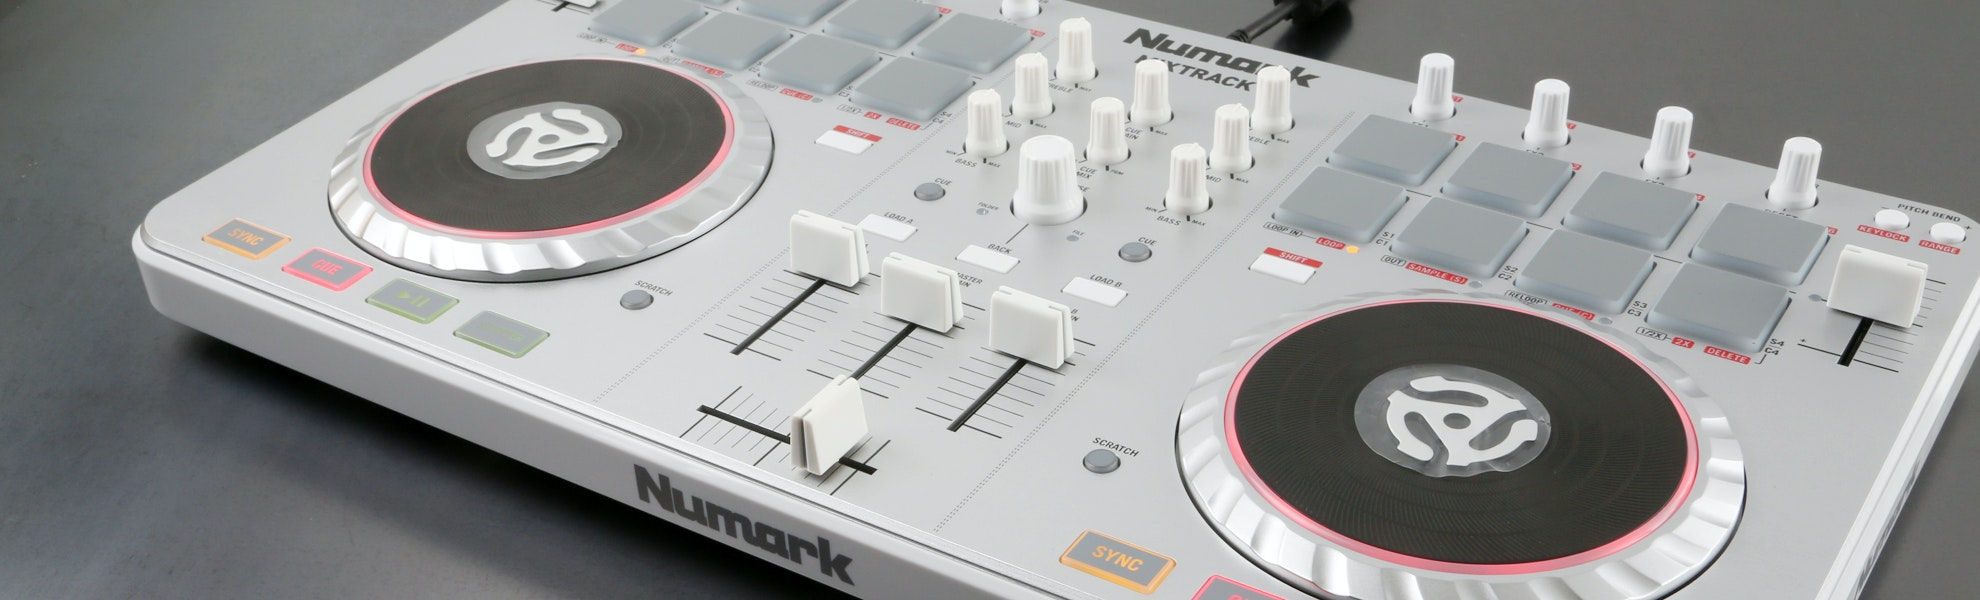 Numark Mixtrack II DJ Software Controller